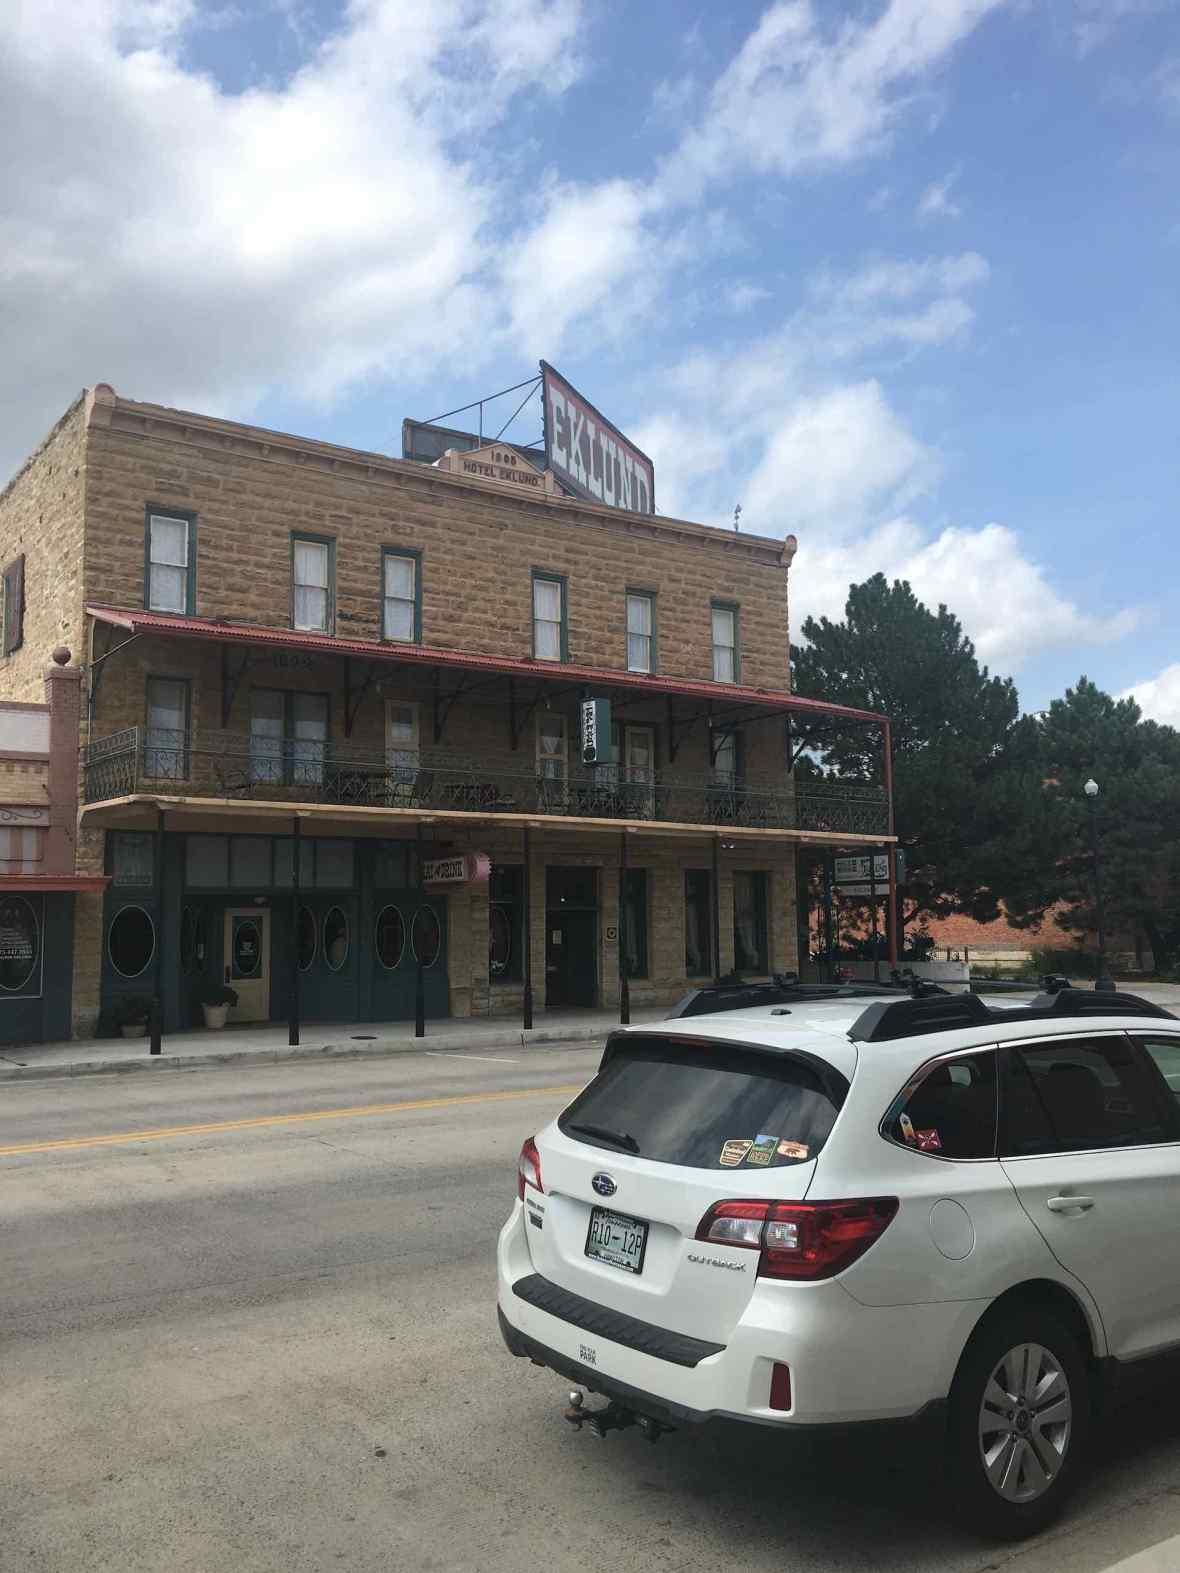 Eklund Hotel Clayton New Mexico